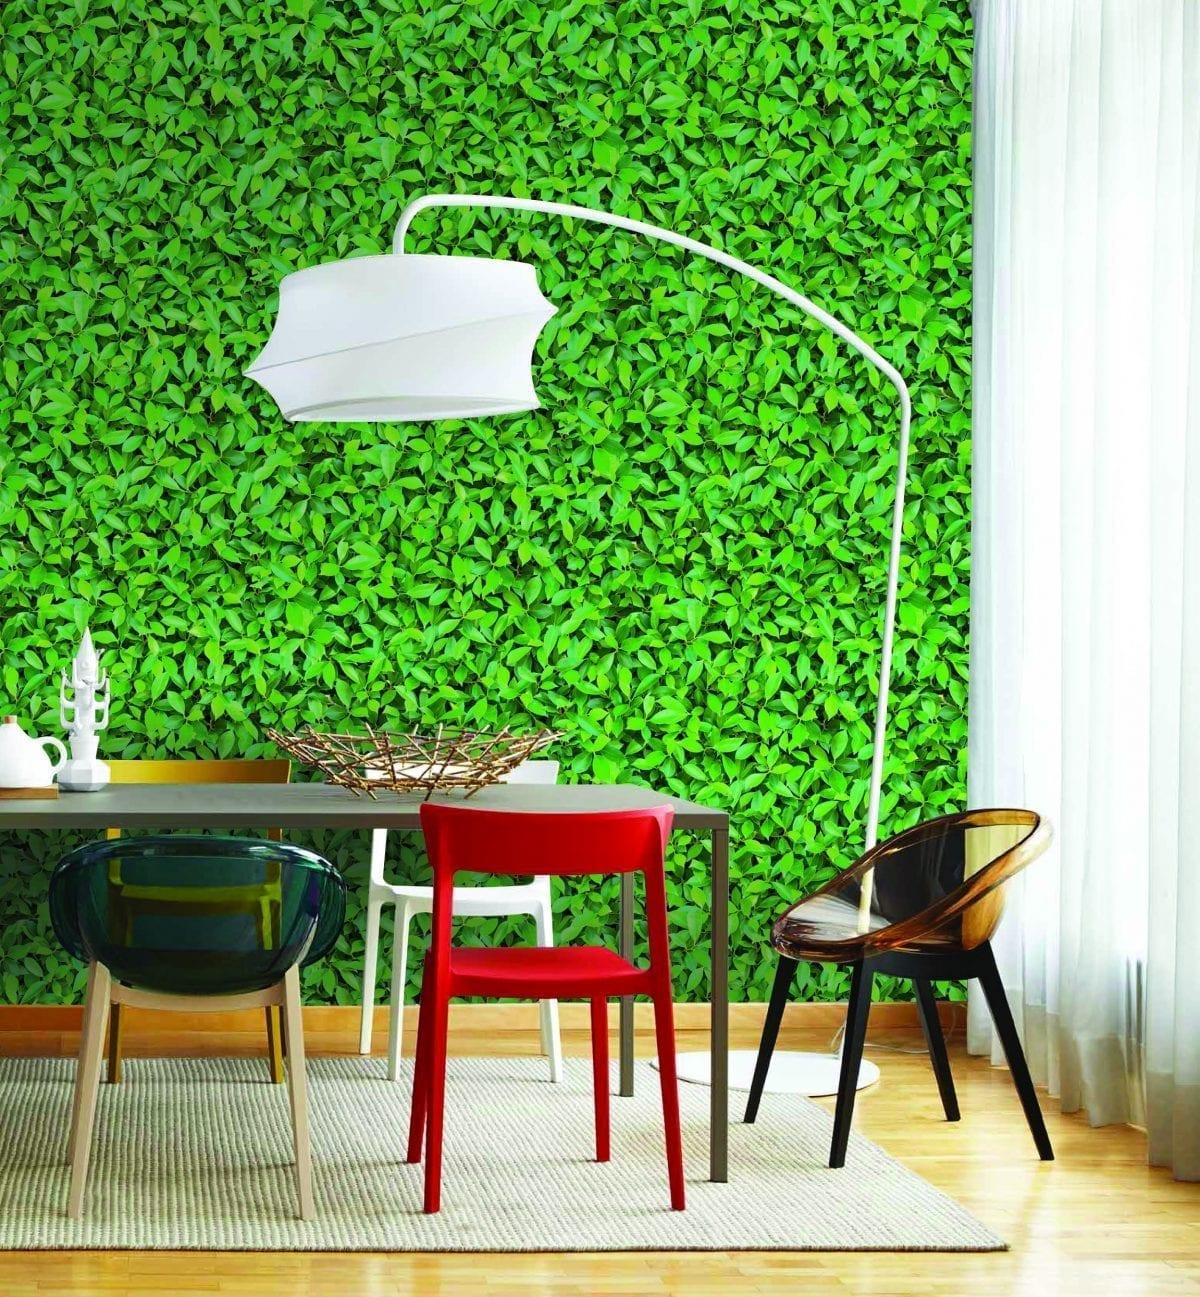 Papel mural muro verde hojas 3480-1 Muresco